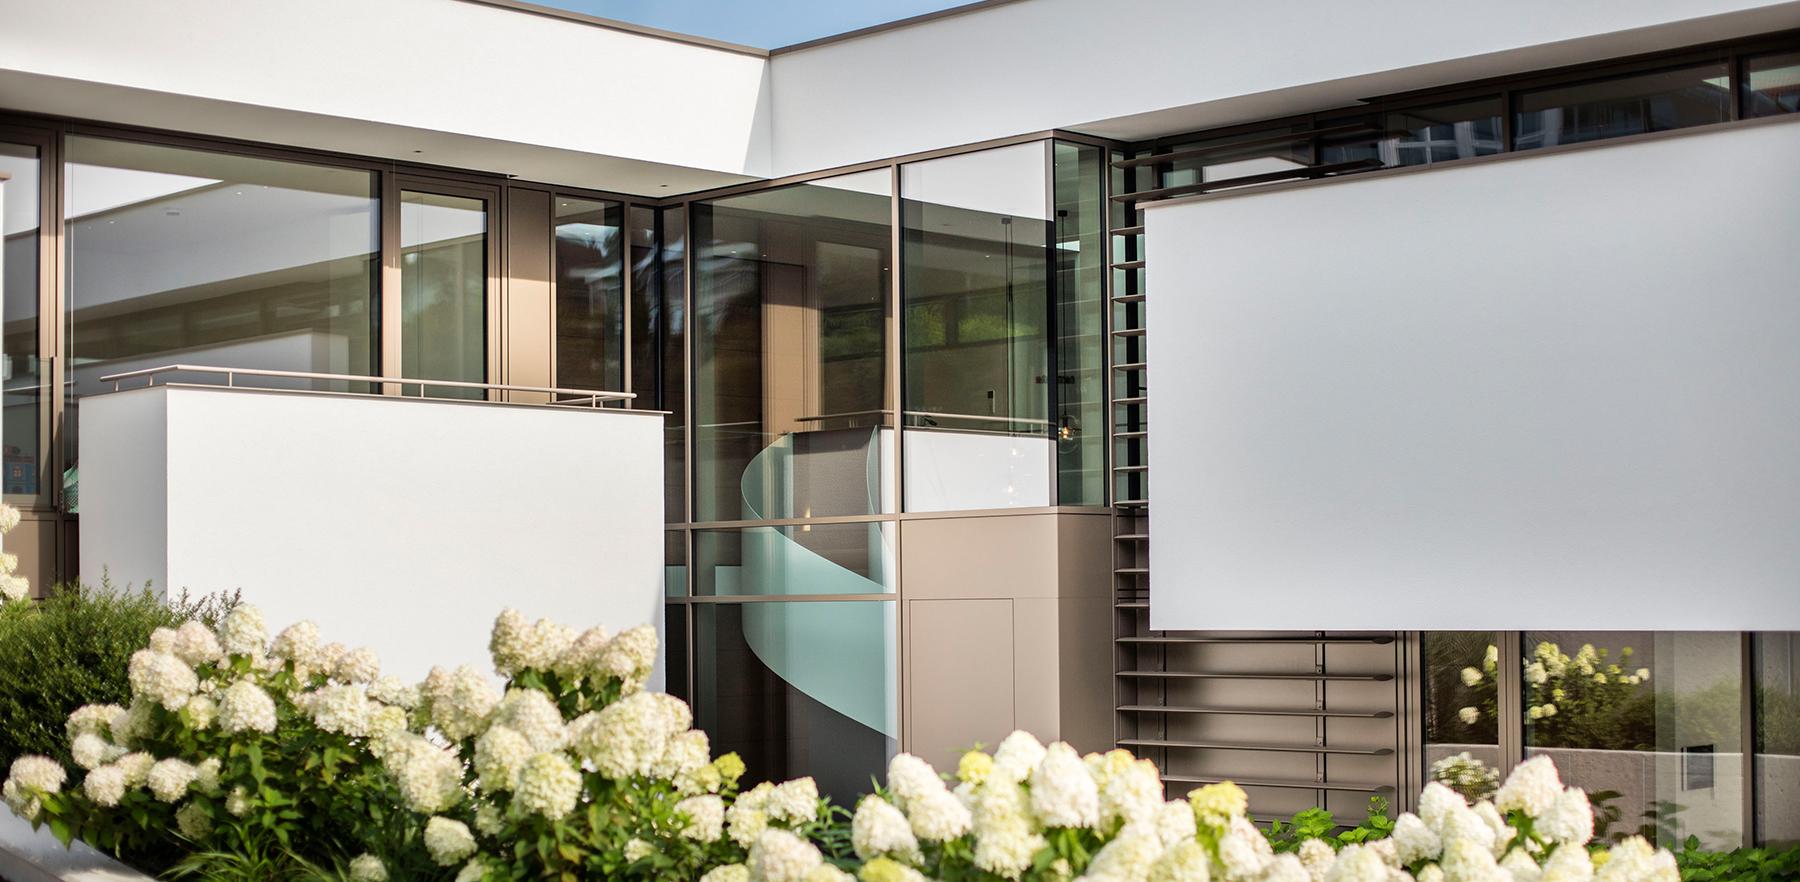 Publikation auf archdaily architekten bda fuchs wacker - Fmb architekten ...